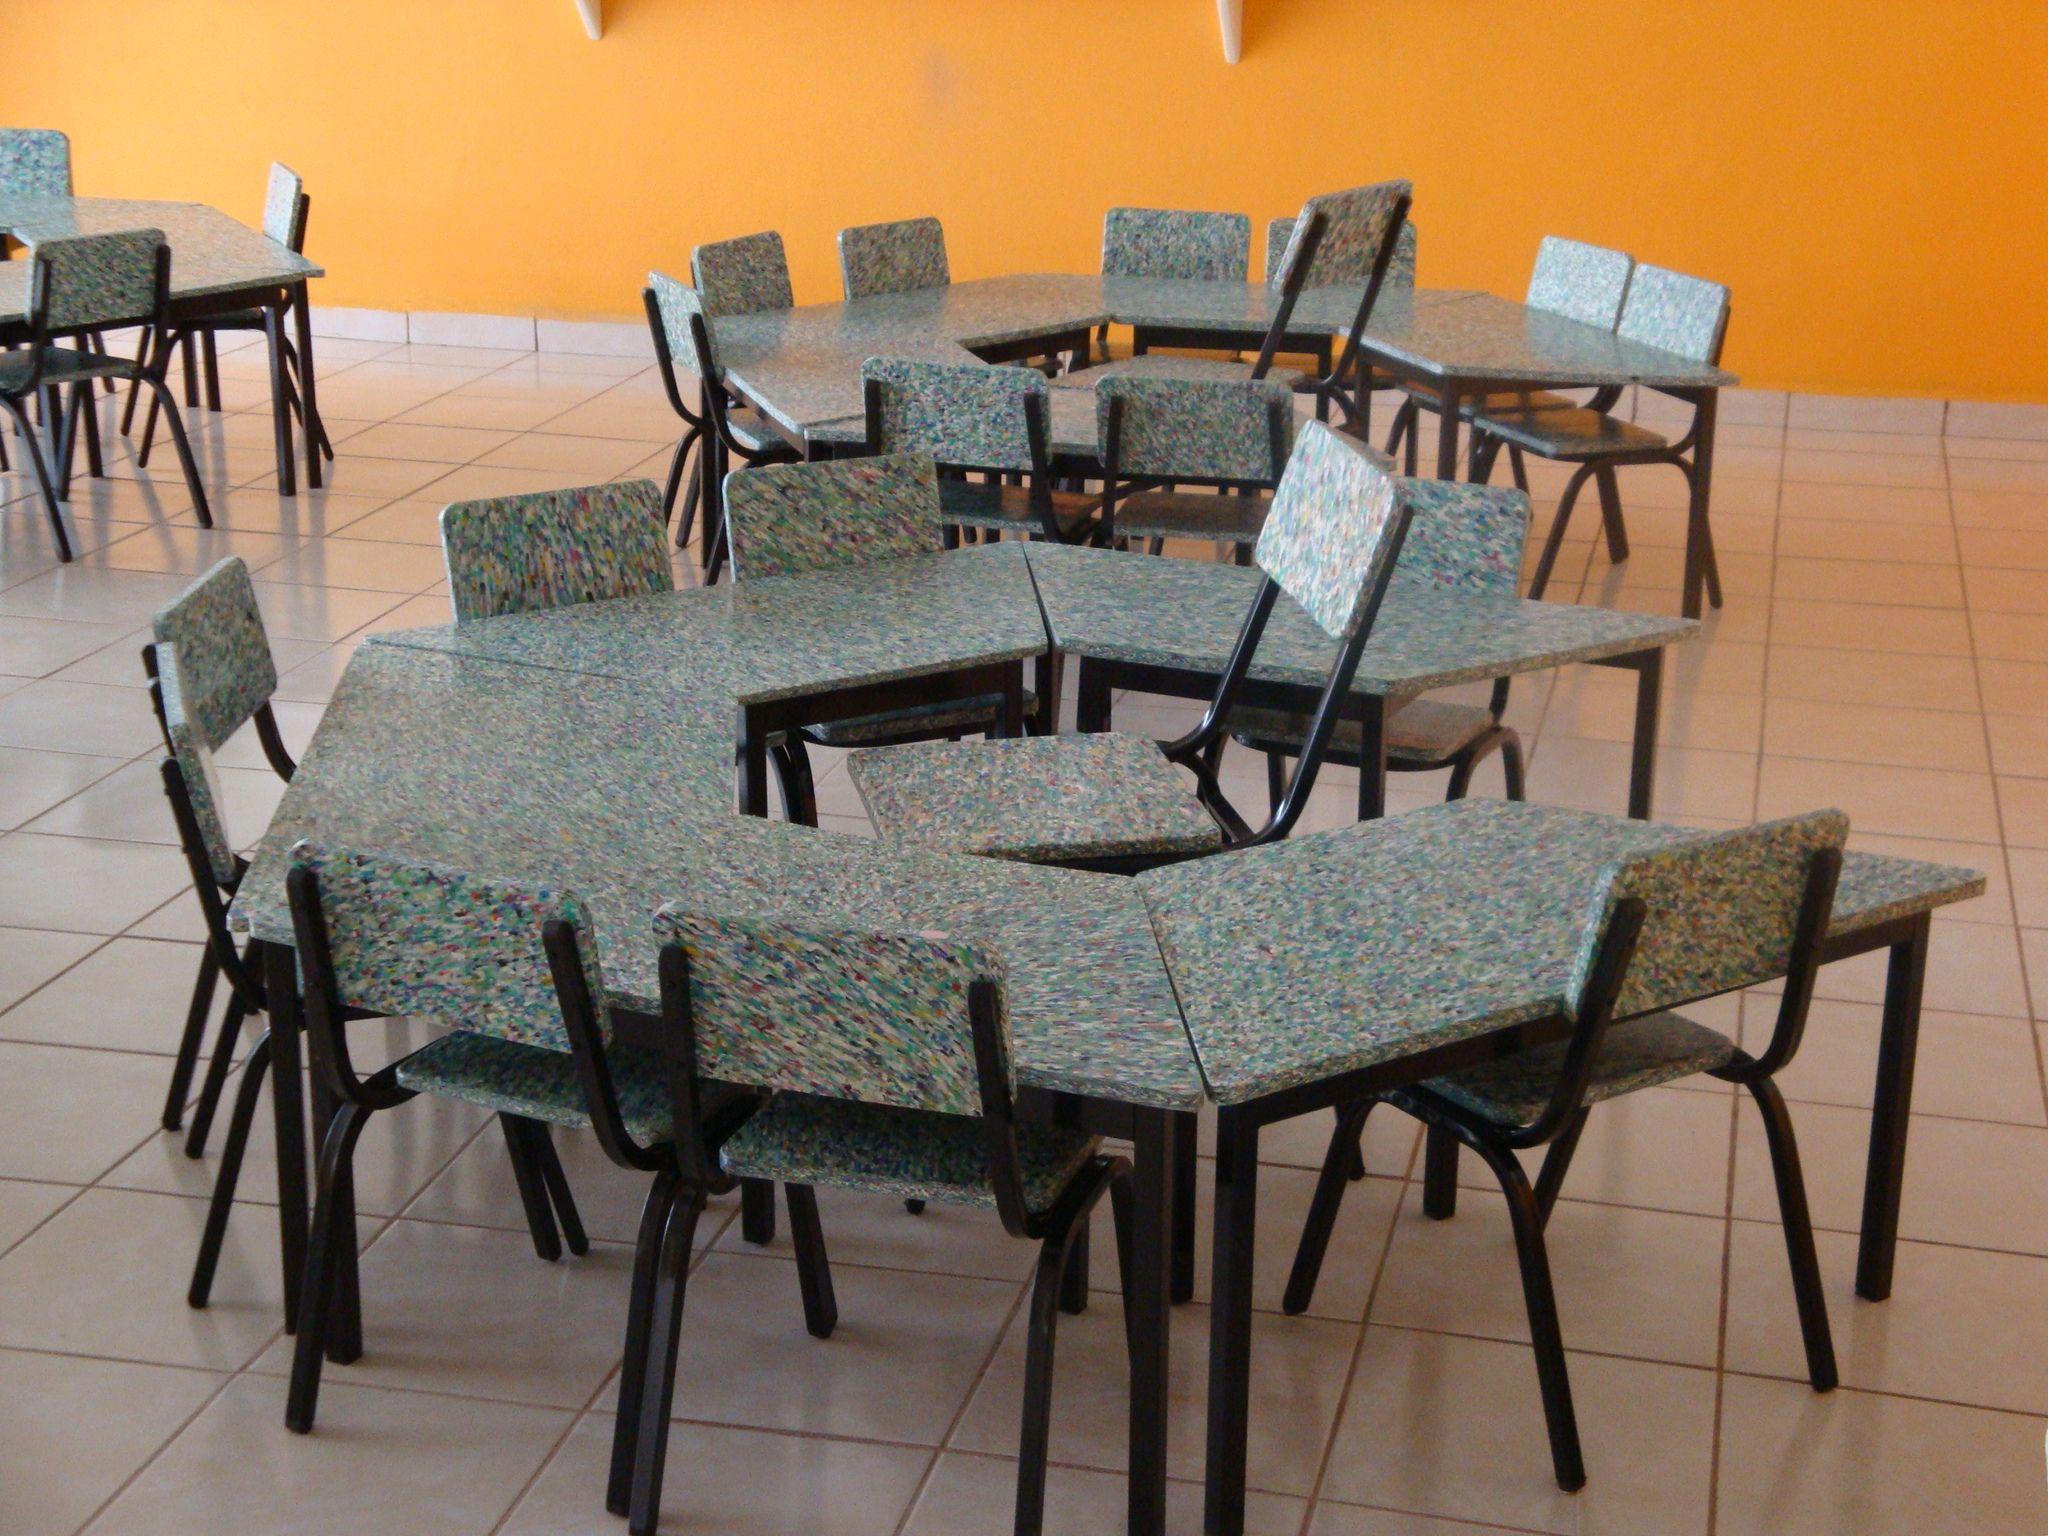 Mobiliario Hecho Con Madera Plastica Plastimadera Plastitablas O  # Muebles Tejidos De Plastico